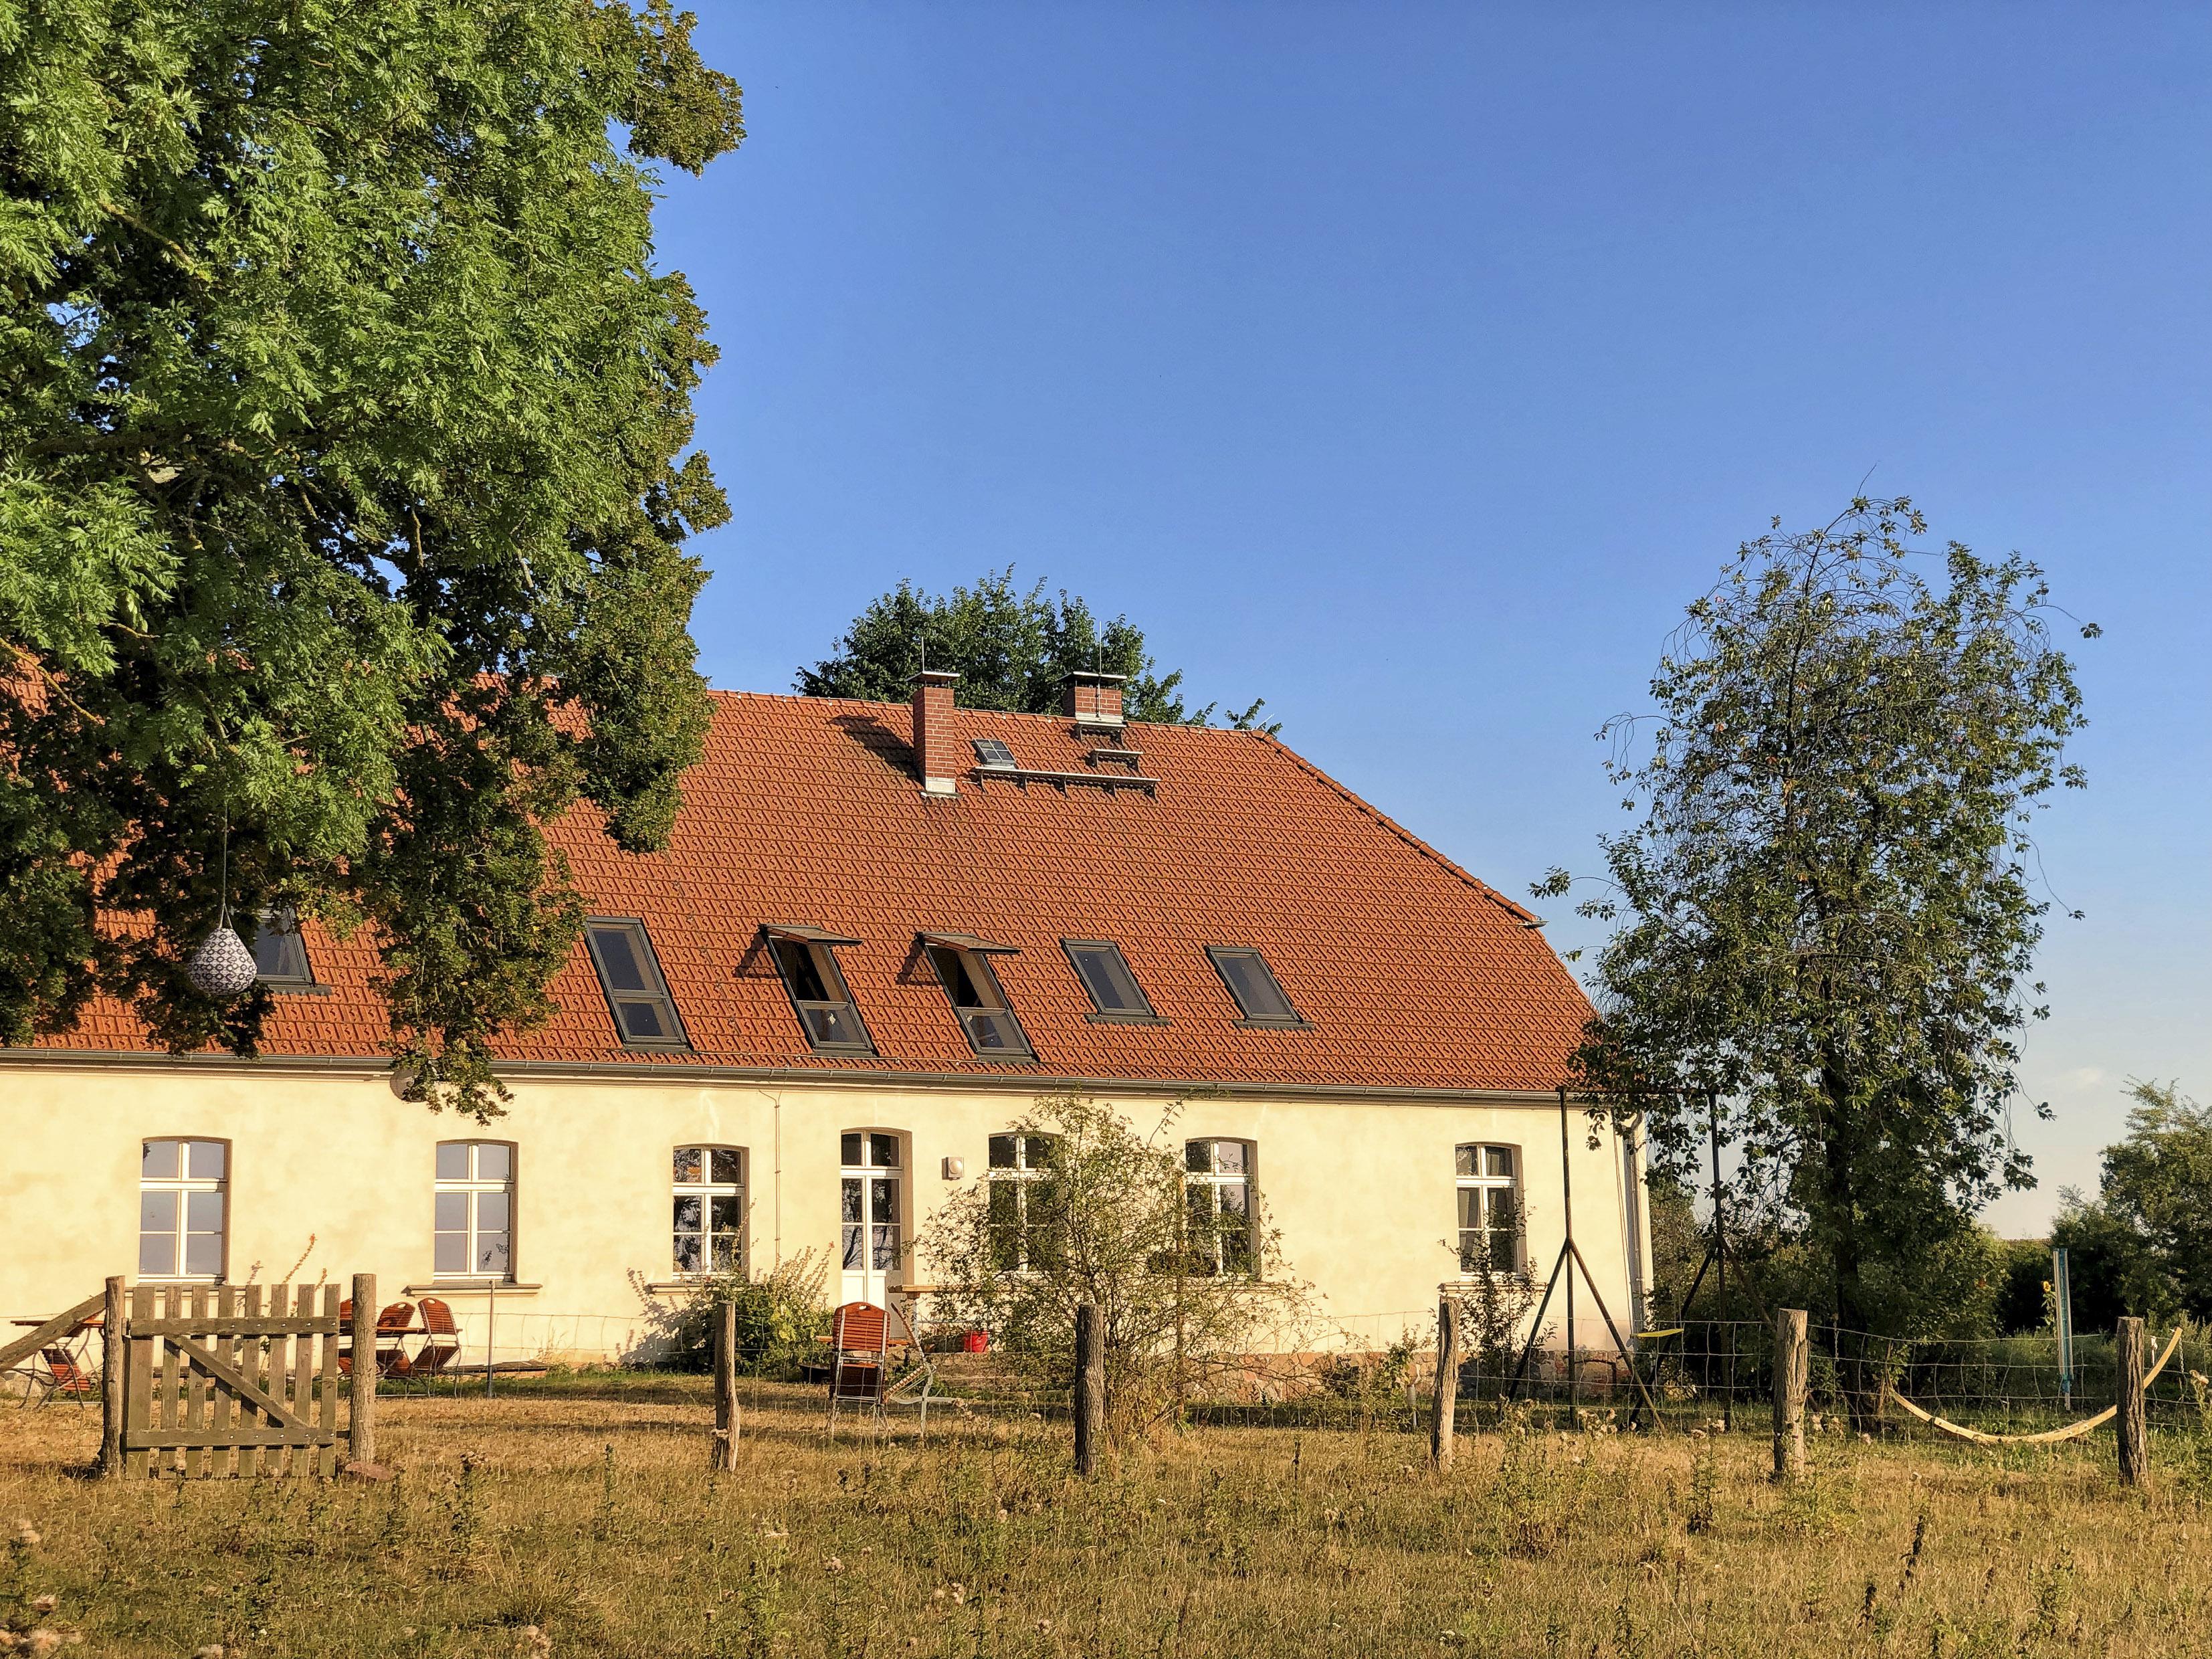 Pastorhof-Eichhorst_42_by_Daniel-Auer_PRINT